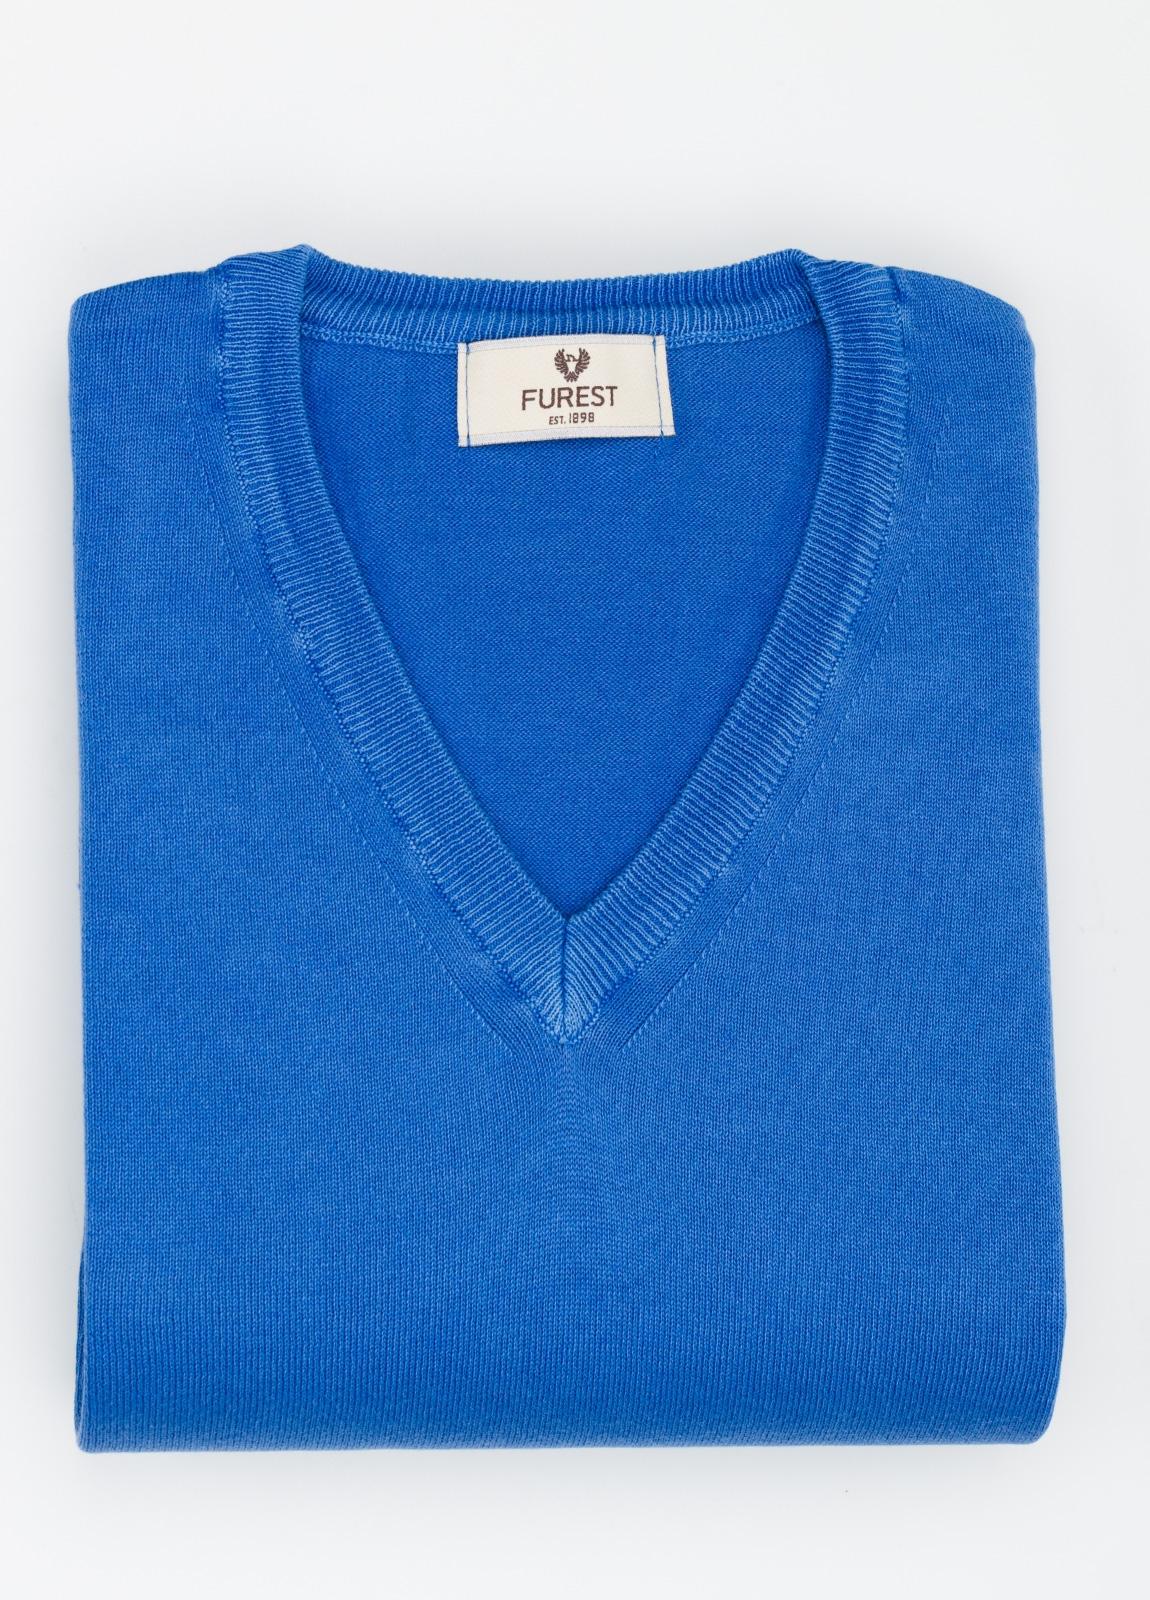 Jersey cuello pico color azulón, 100% Algodón.